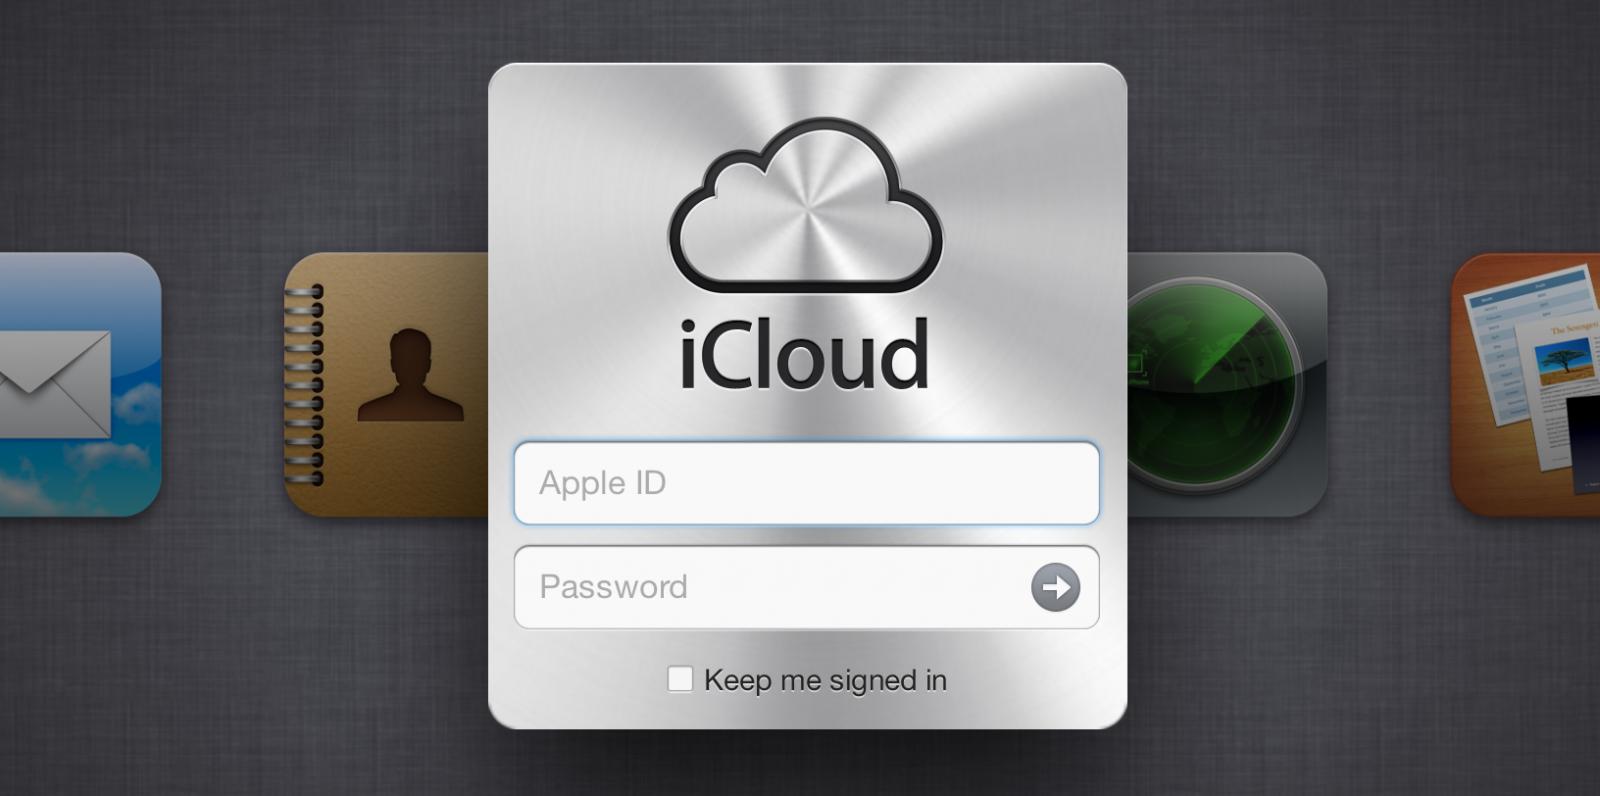 Apple's iCloud storage system